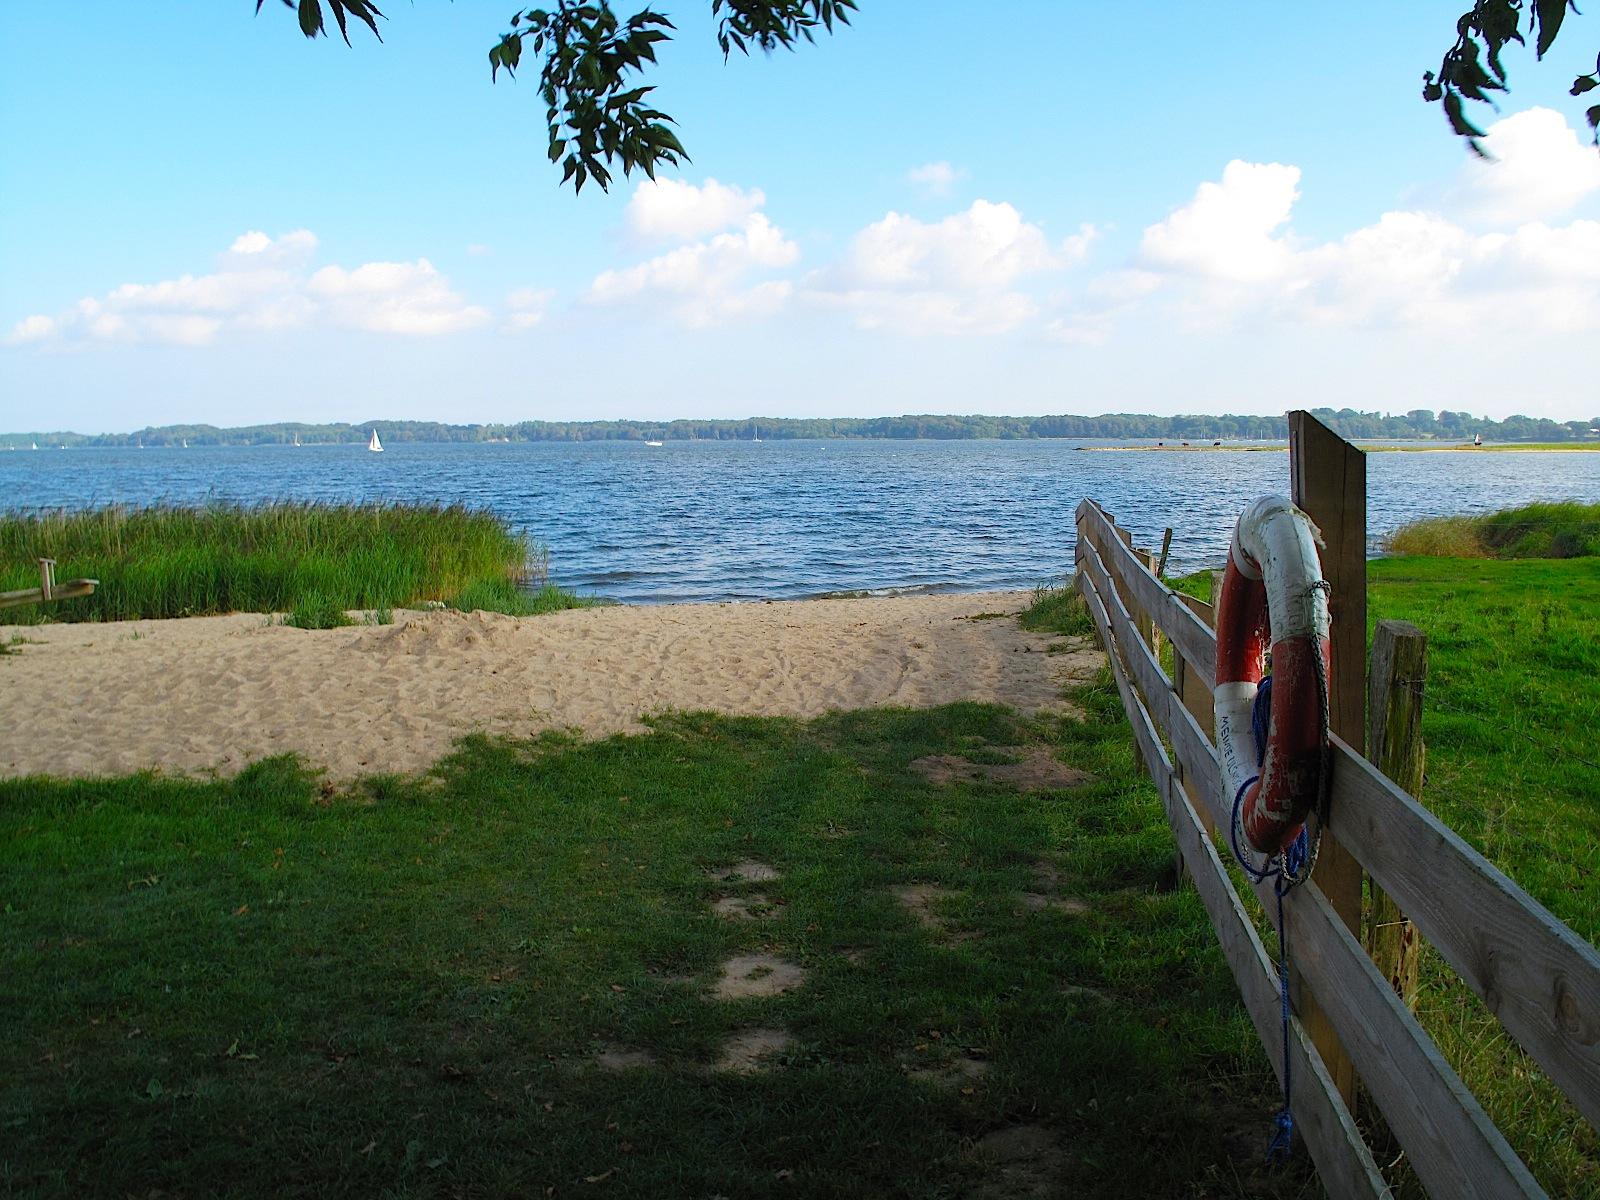 Badestelle Ulsnis